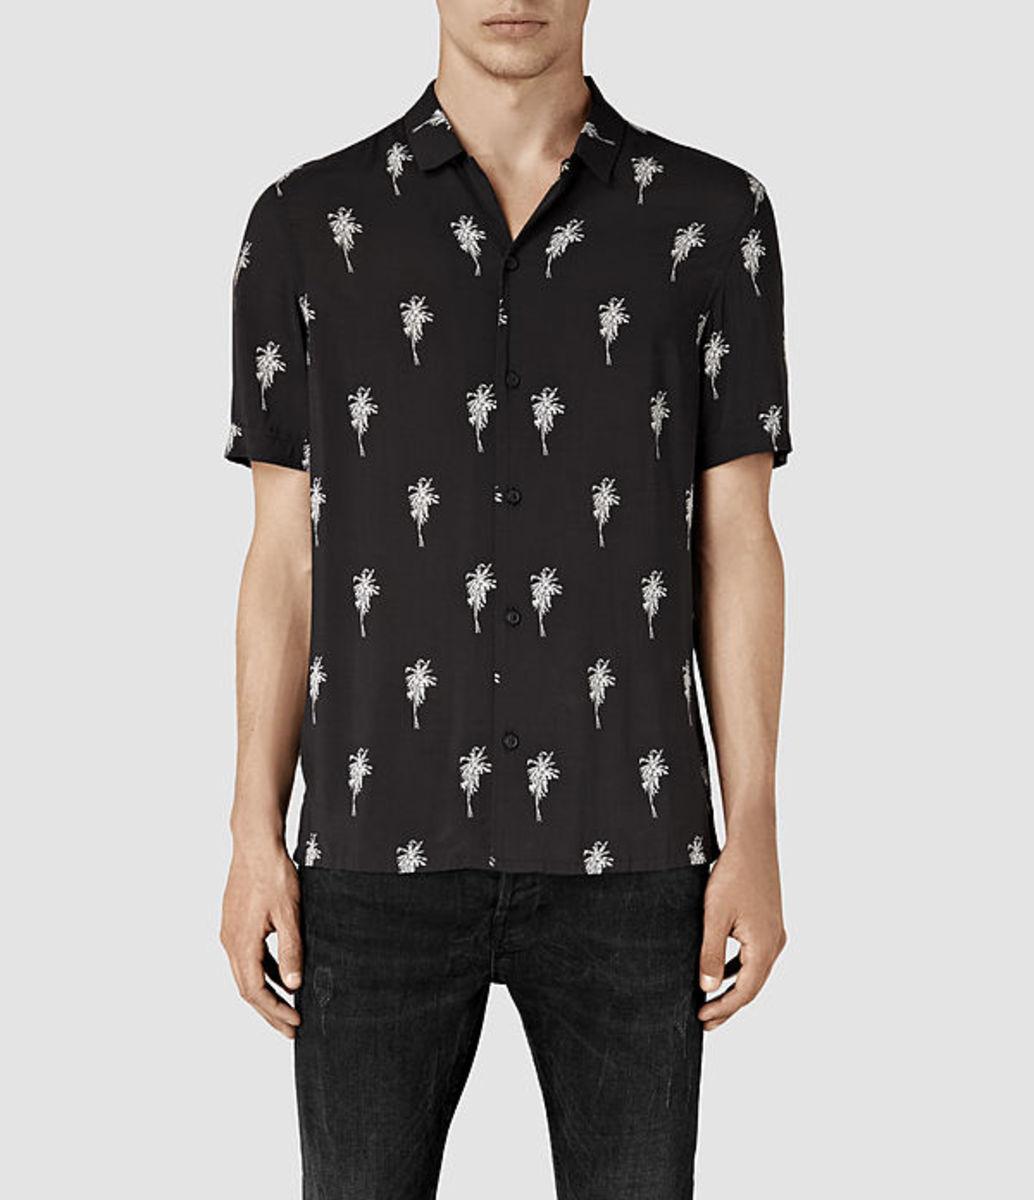 All Saints Men's Archo Short Sleeve Shirt, $155, available at All Saints.